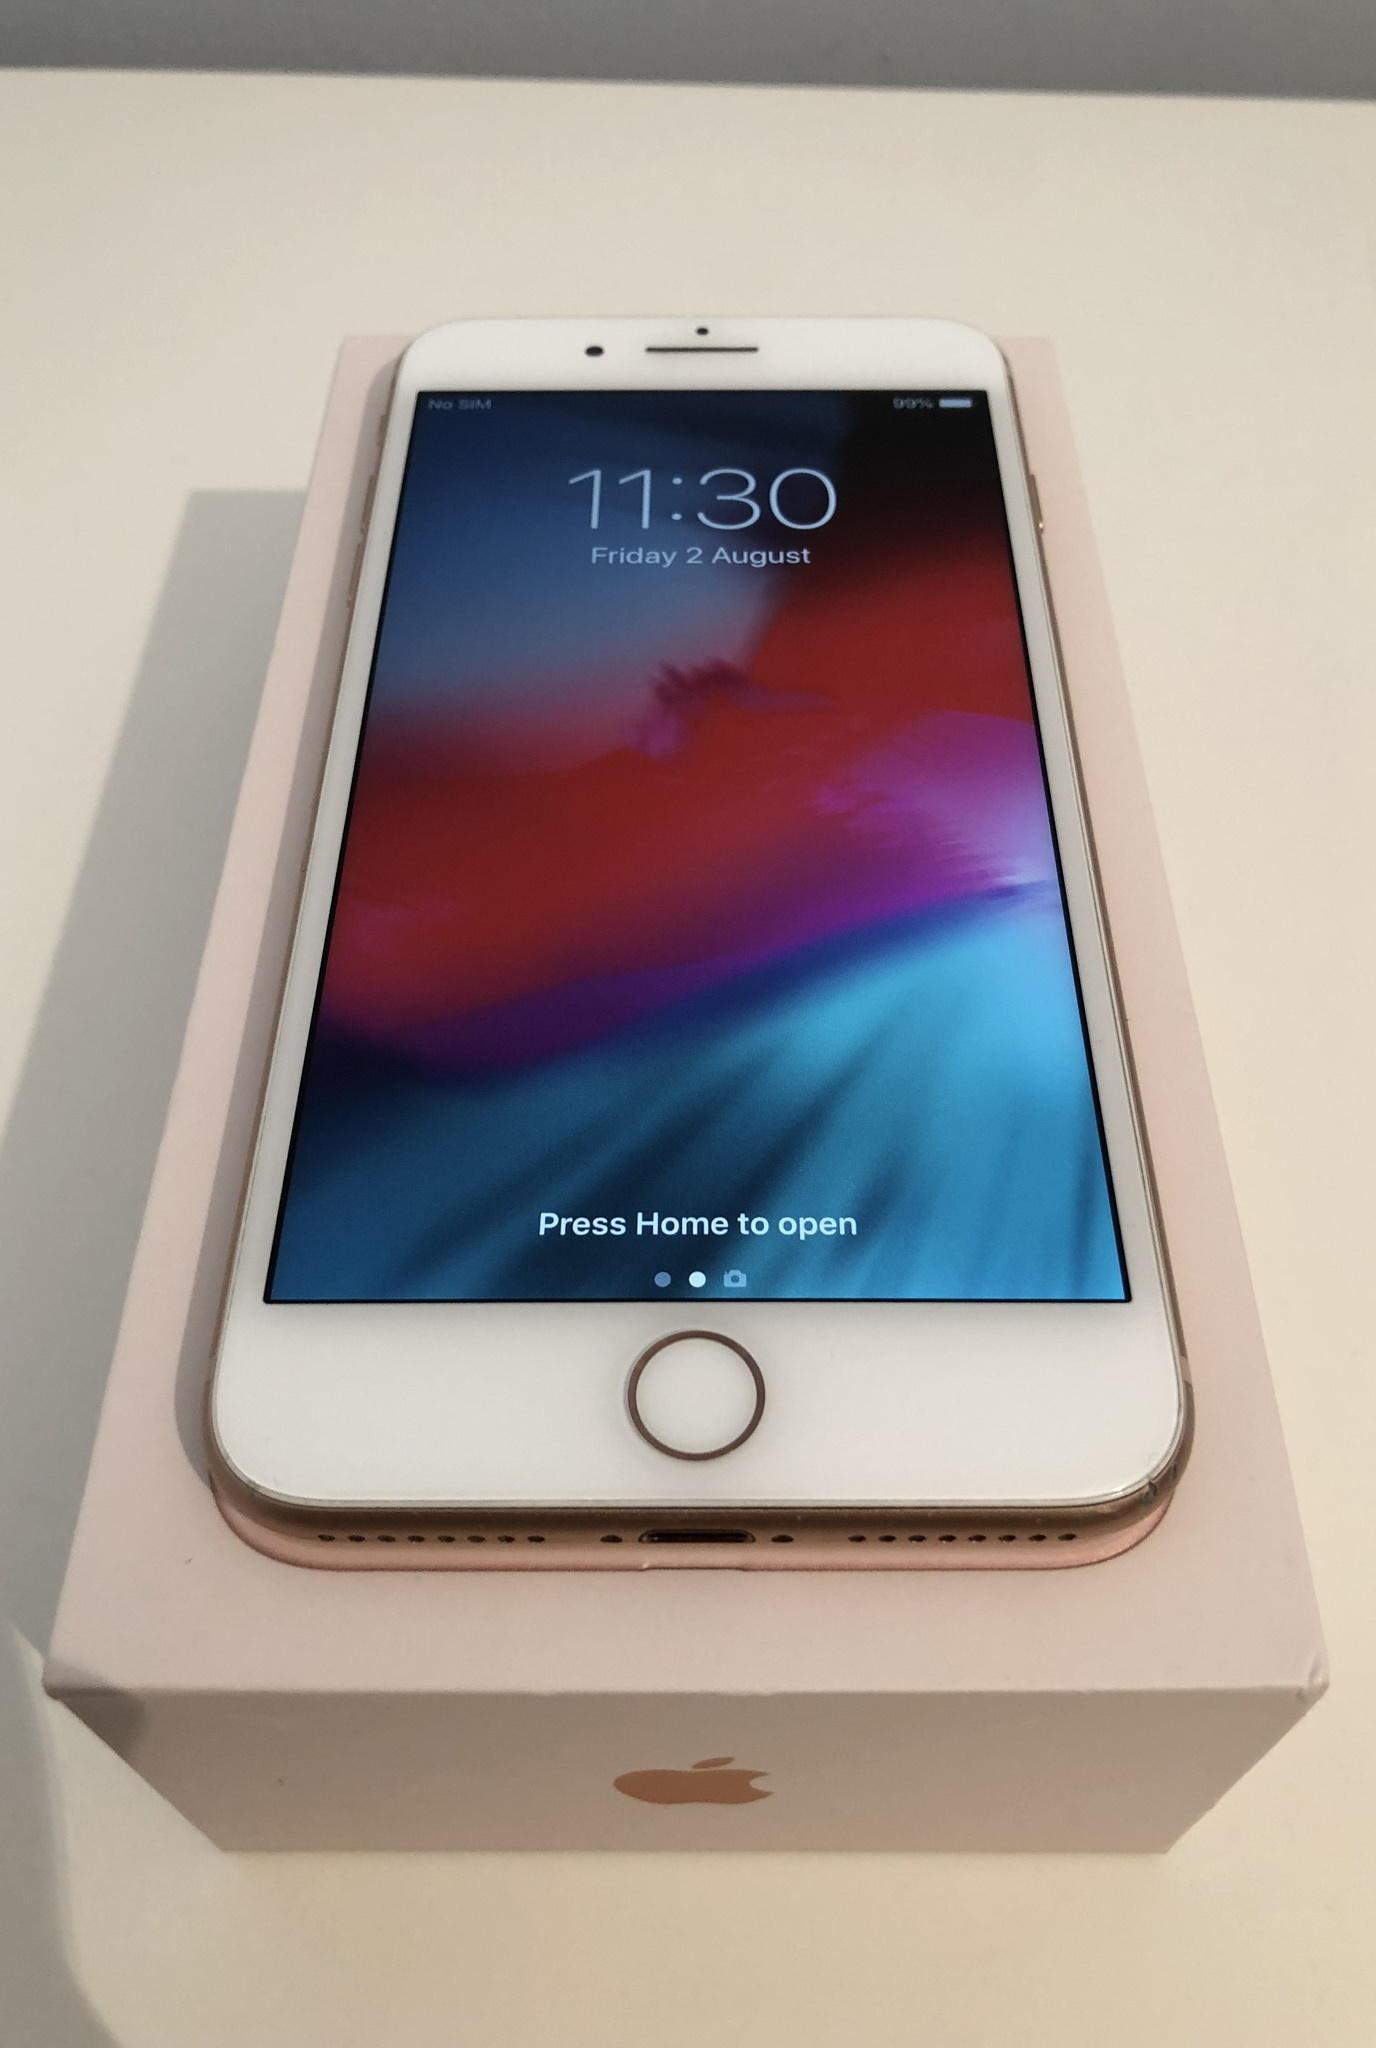 iPhone 8 Plus 64GB Gold (Unlocked)